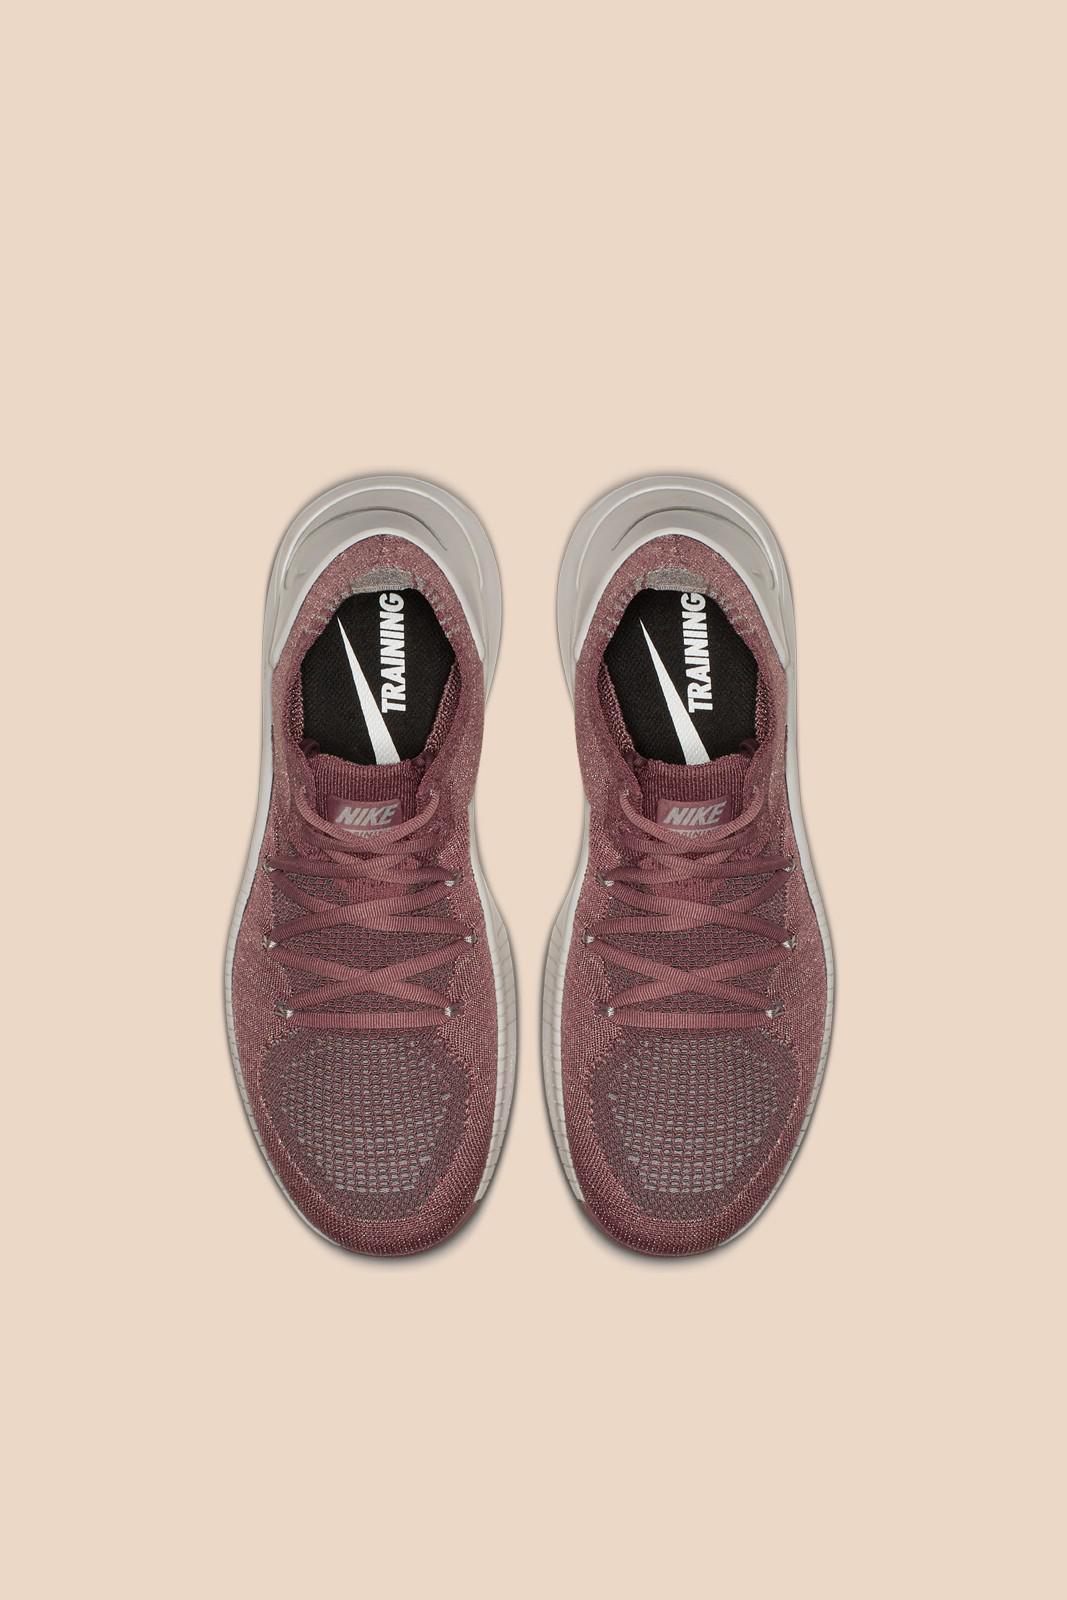 af6a1aac4ca7fe Nike - Multicolor Free Tr Flyknit 3 Lm - Lyst